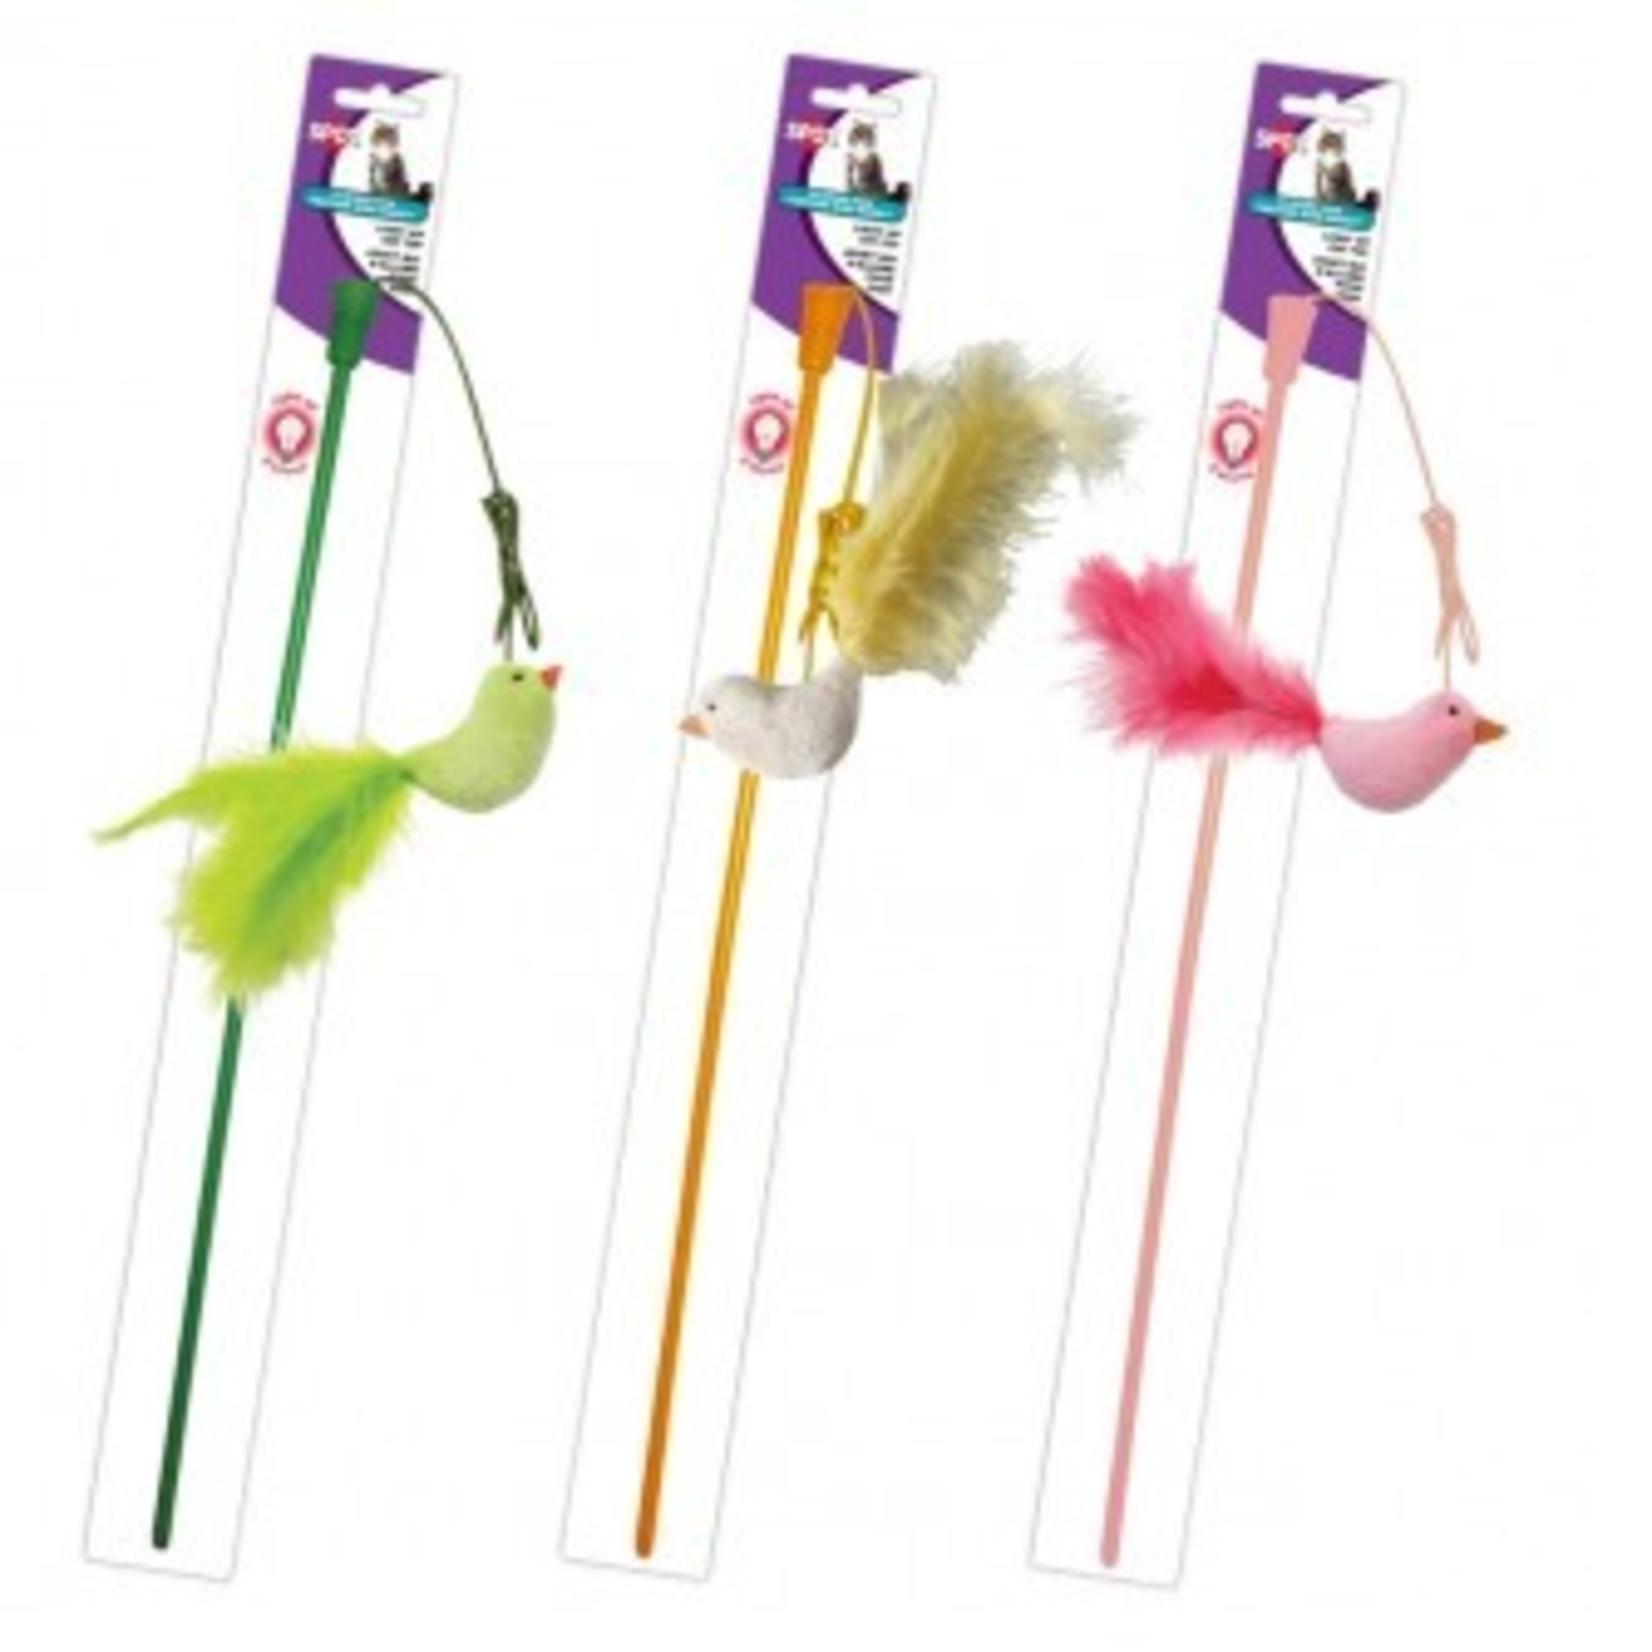 SPOT Flicker Fun Wand - Feather Bird 15 in